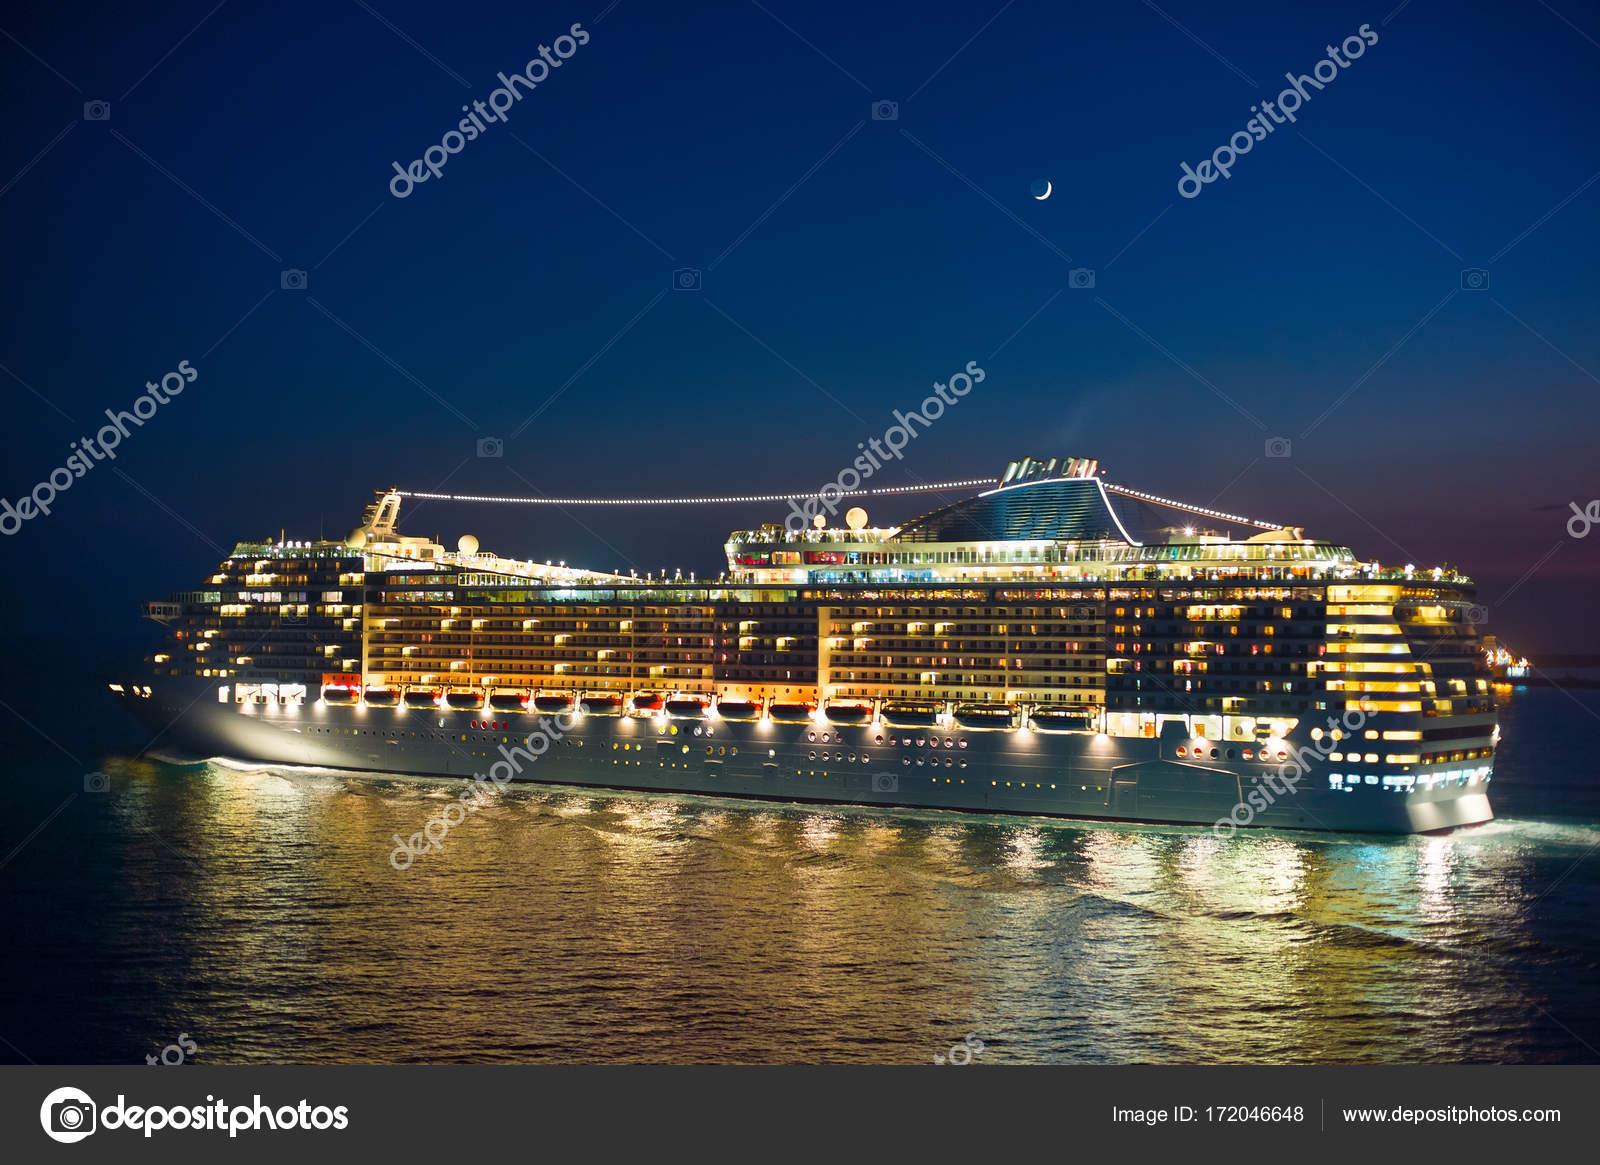 https://st3.depositphotos.com/1000151/17204/i/1600/depositphotos_172046648-stock-photo-cruise-liner-and-new-moon.jpg